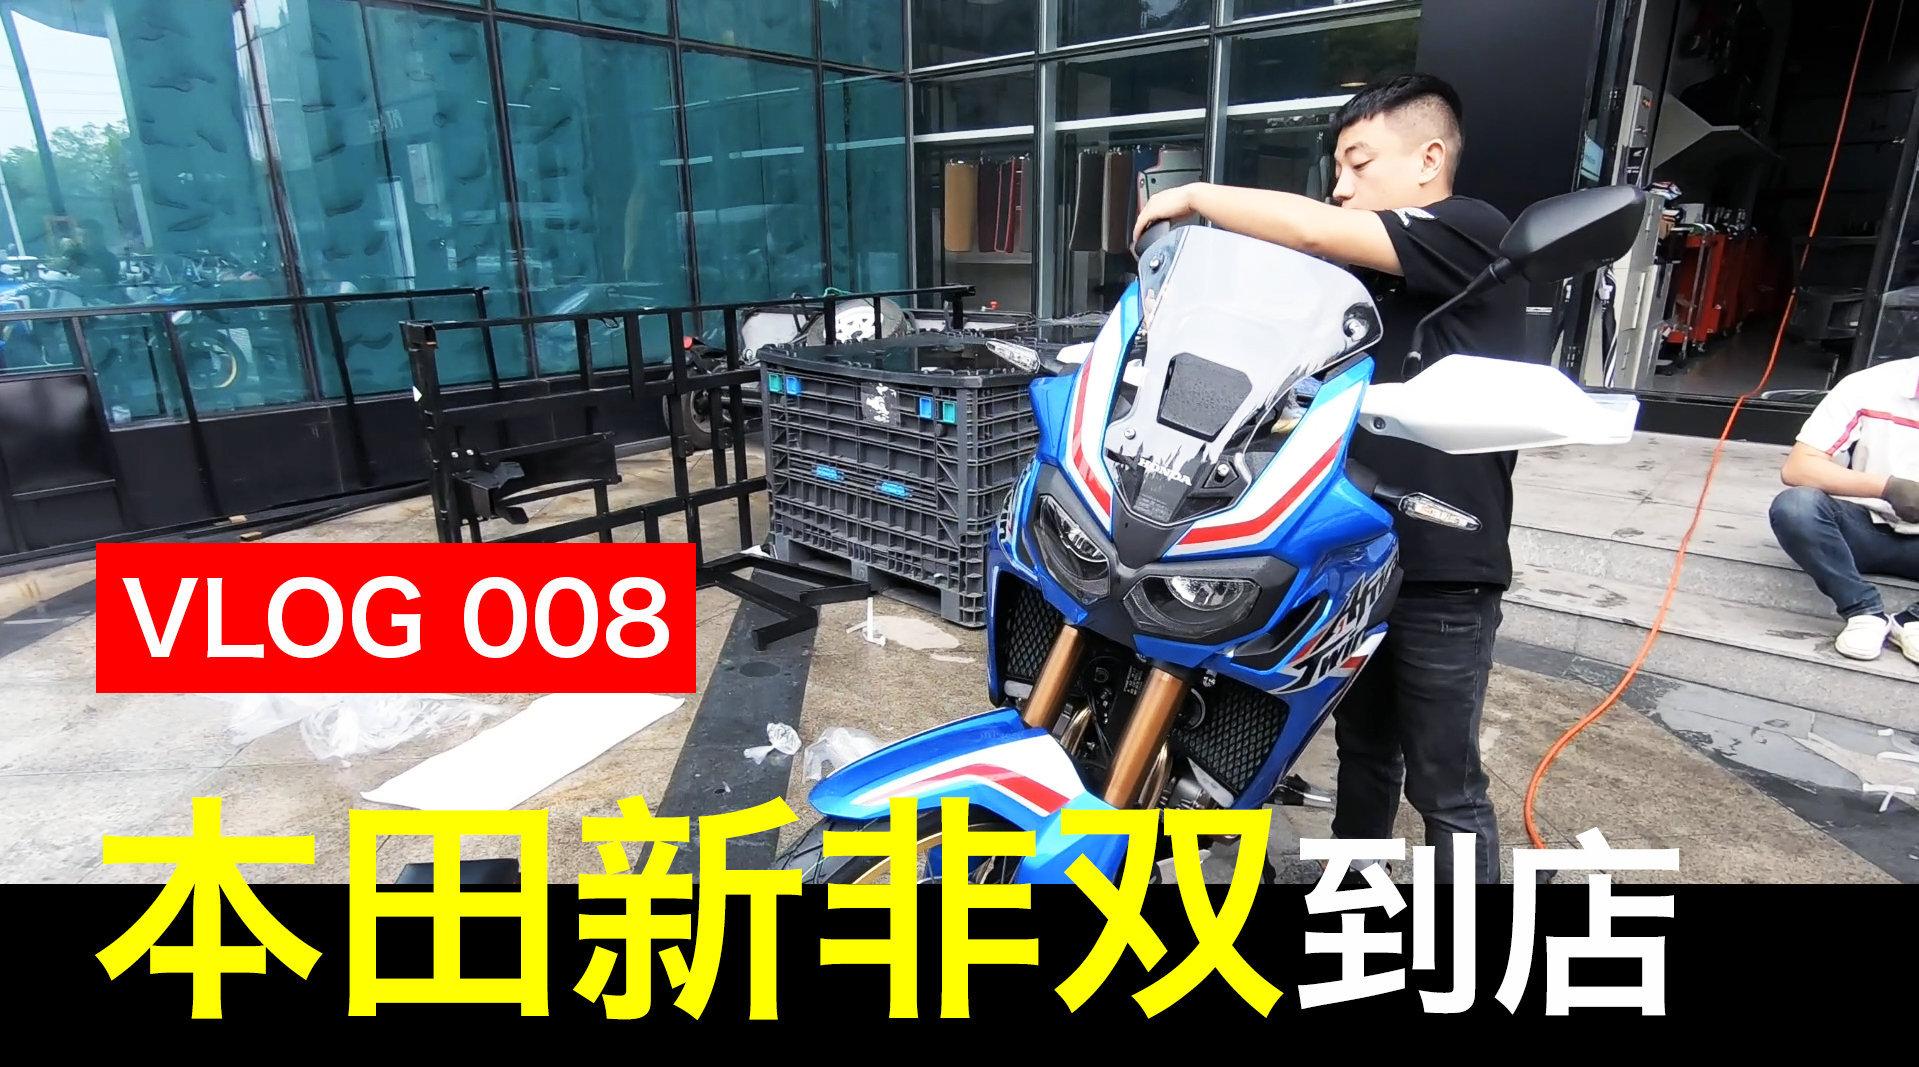 VLOG | 本田新款非双(CRF1000L)到店实拍,可惜去晚了没拍到开箱